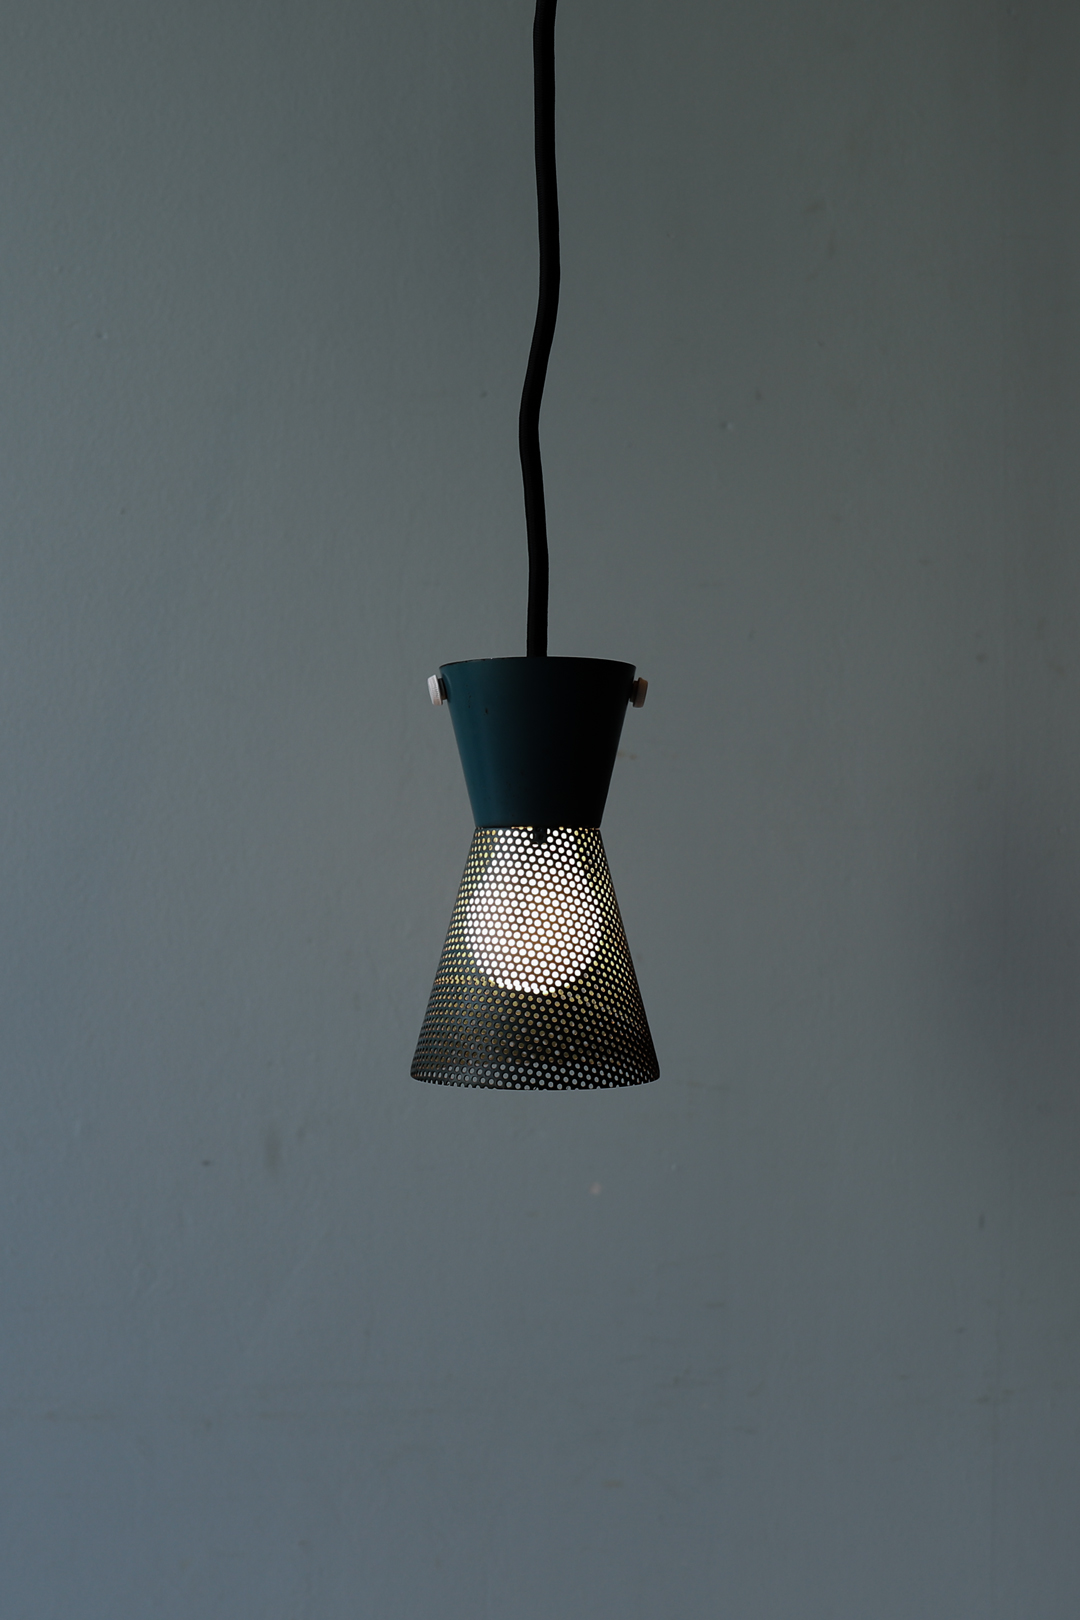 Vintage Perforated Iron Shade Pendant Light/ヴィンテージ アイアン シェード ペンダントライト 照明 インダストリアル